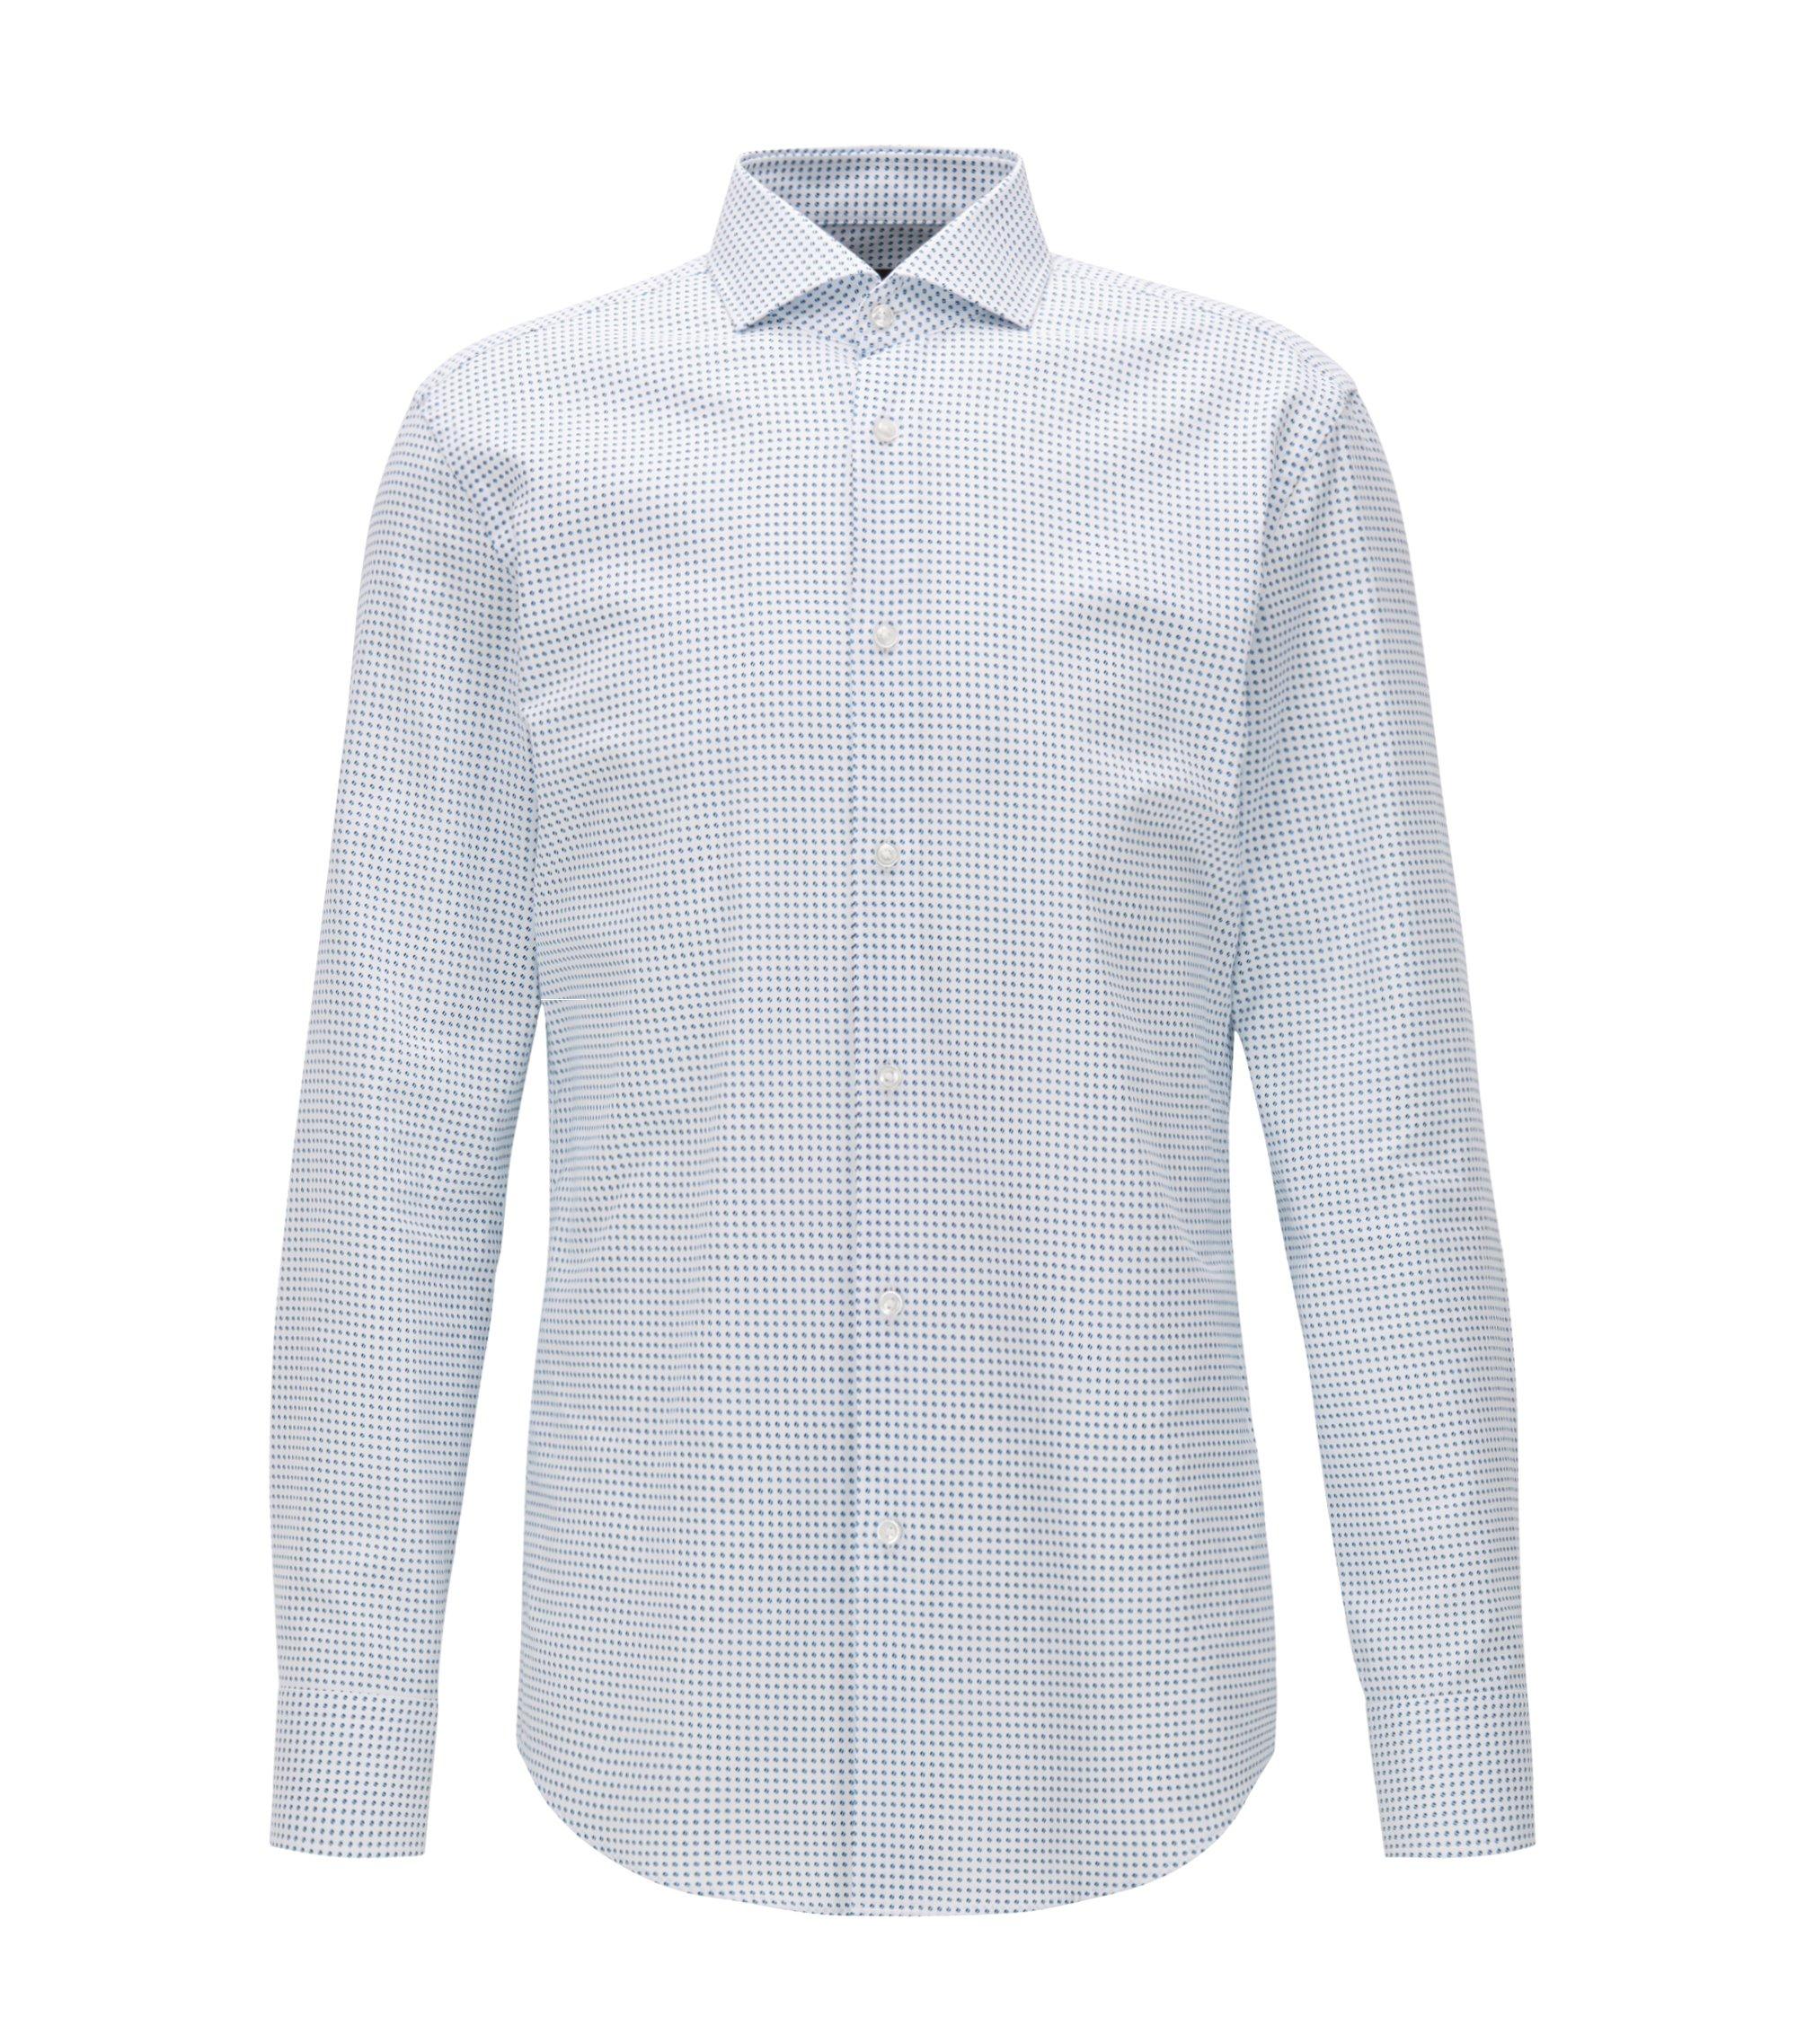 Dotted Cotton Dress Shirt, Slim Fit | Jason, Blue